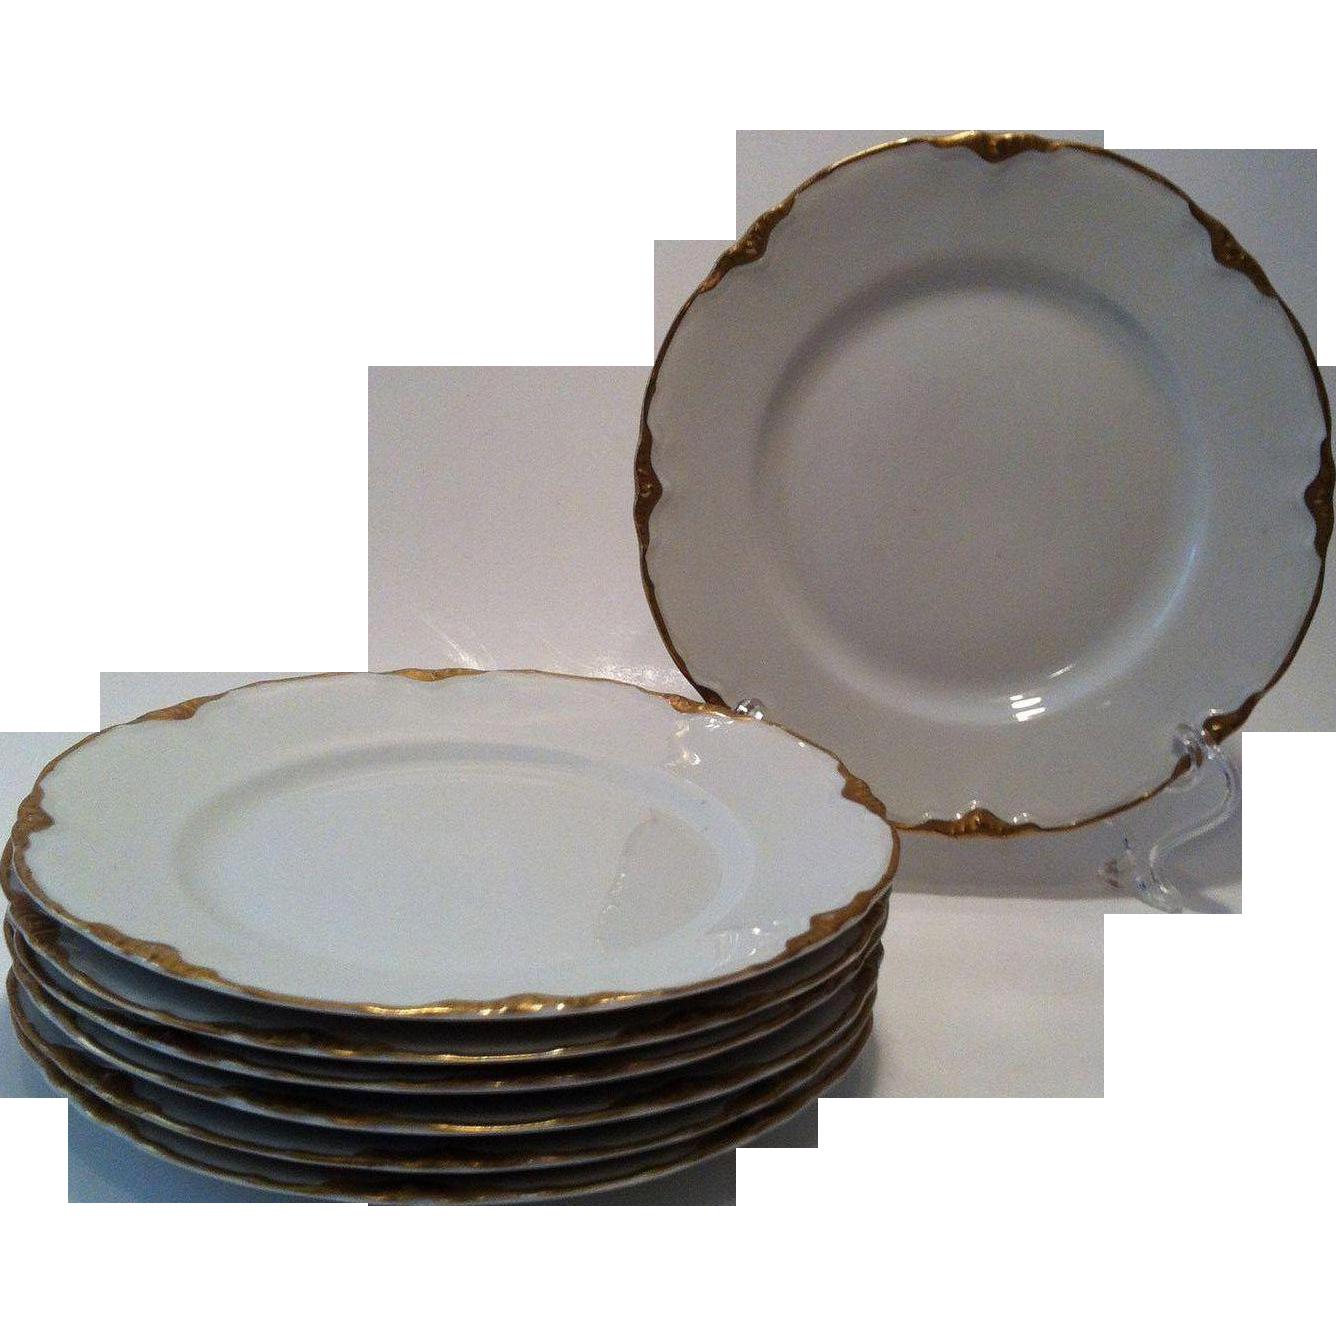 3 Bread & Butter Plates Warwick Chateau # 2100/1202